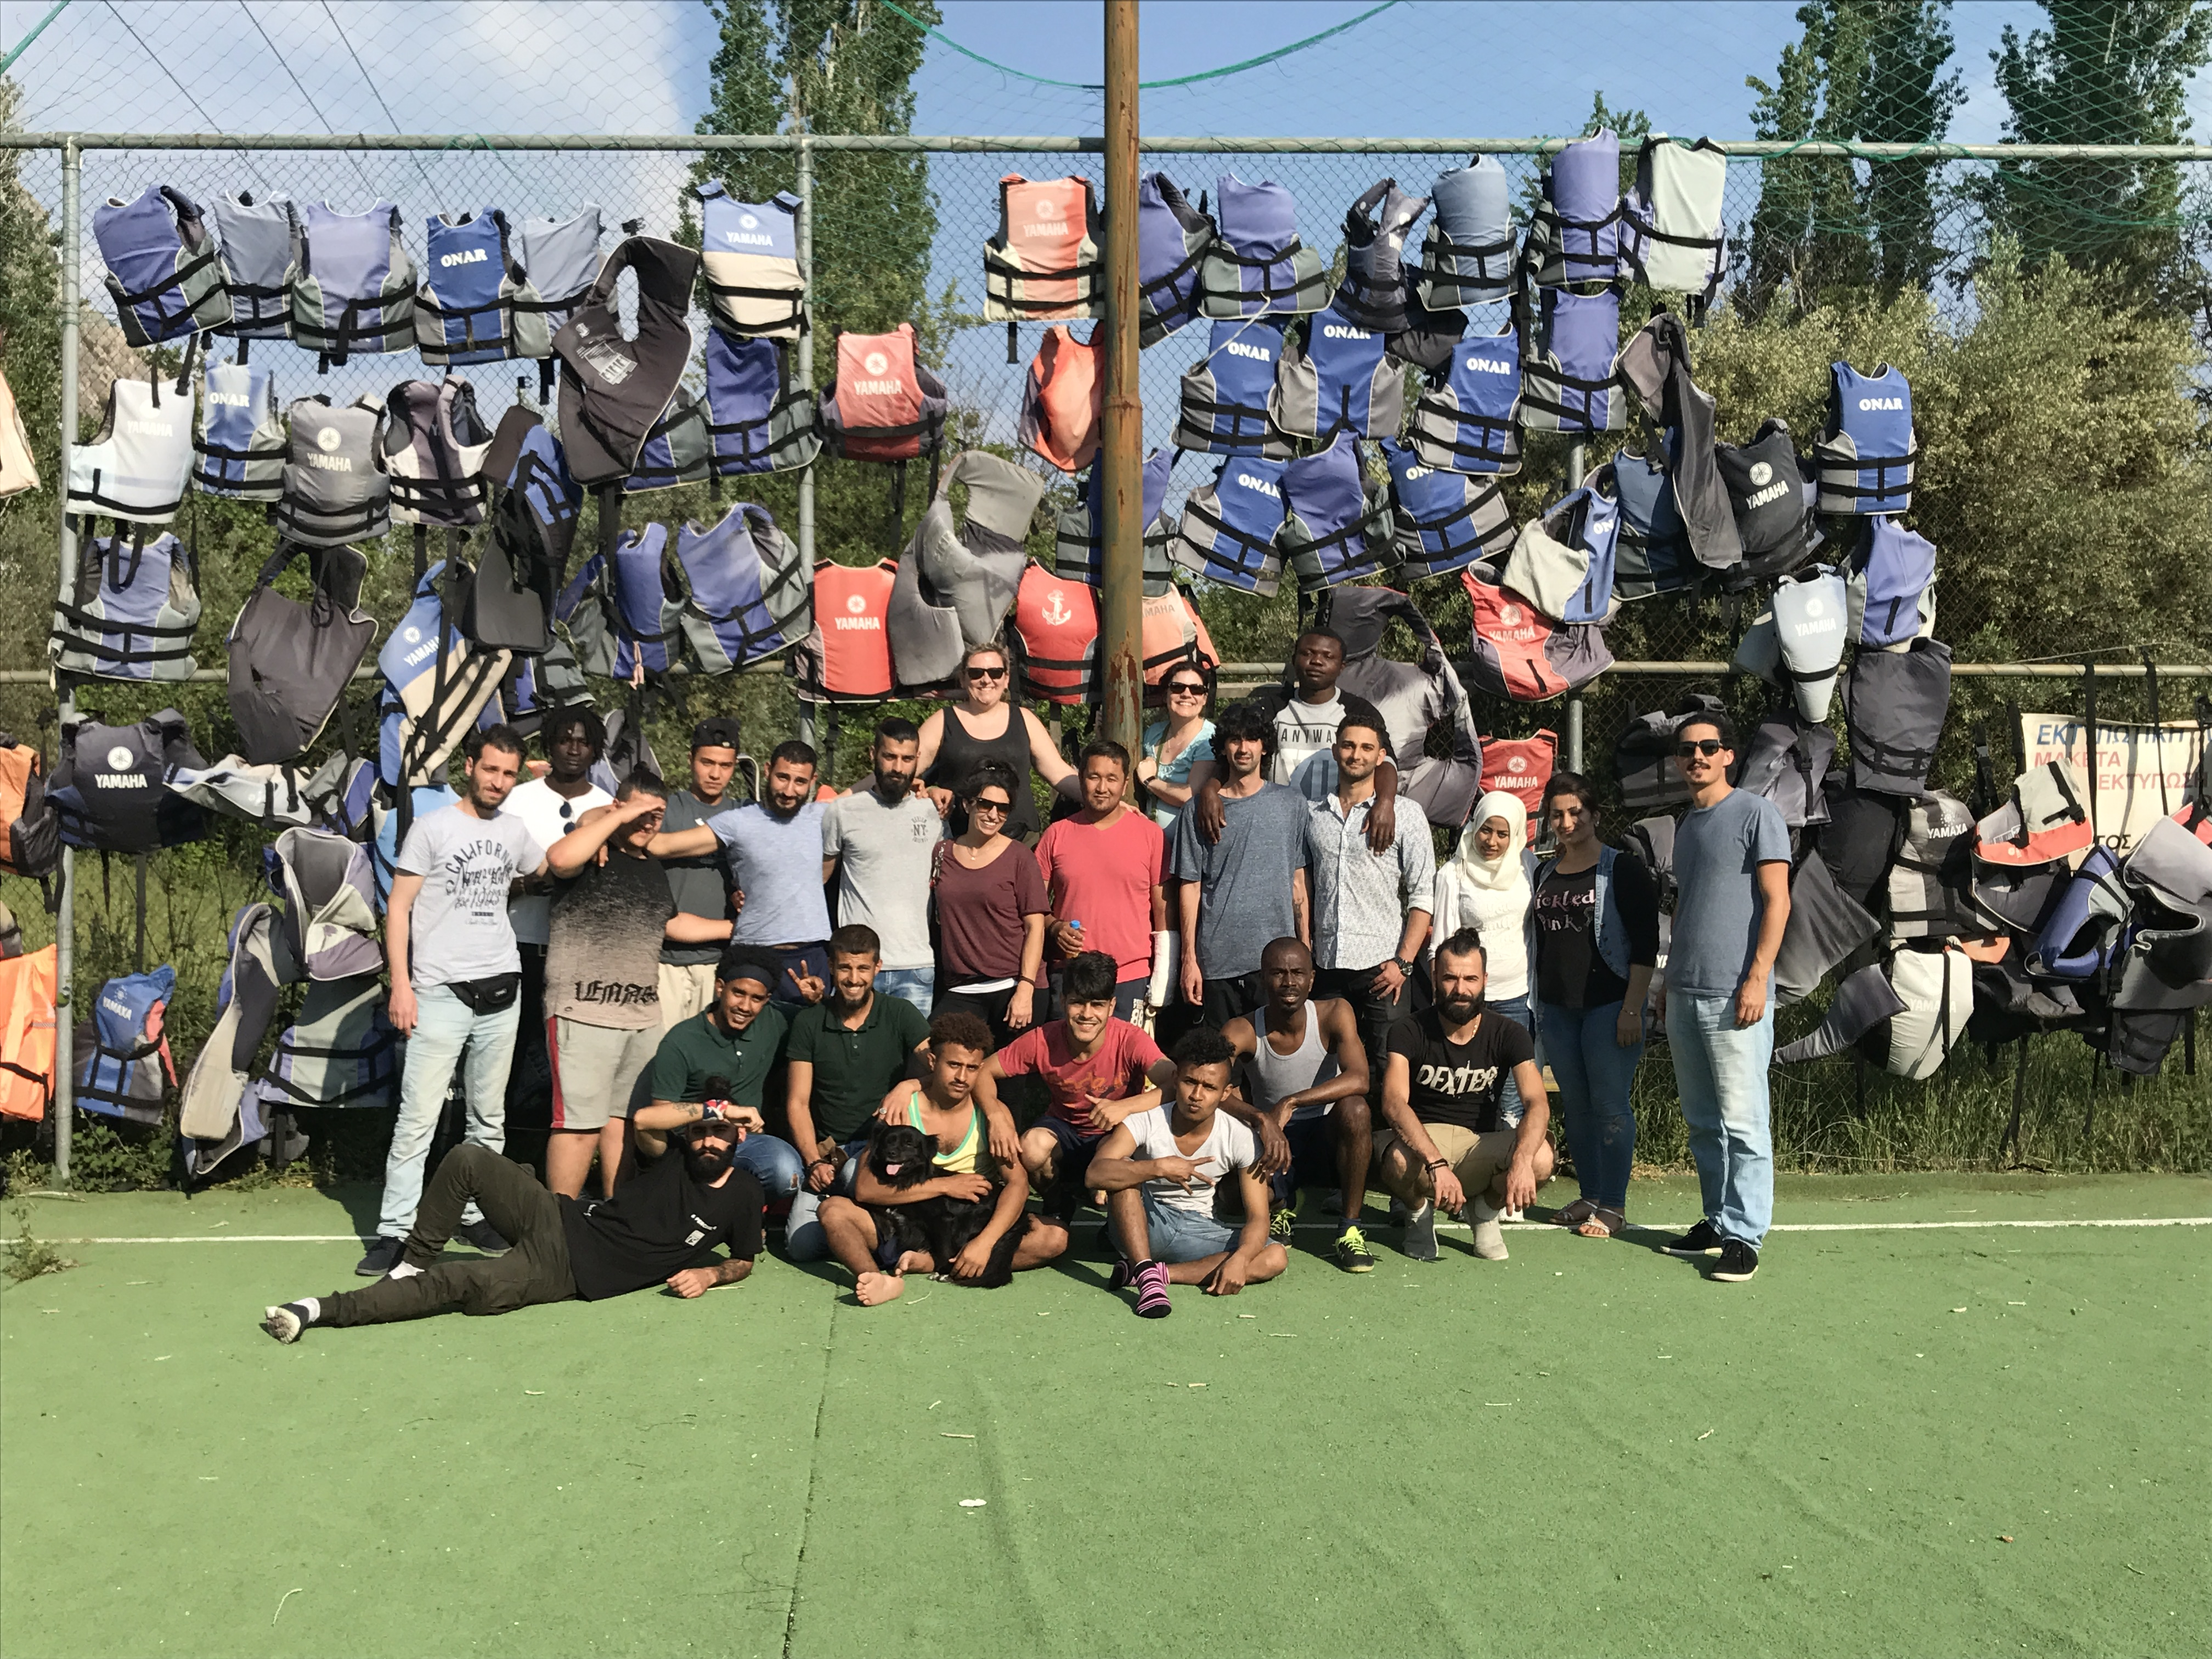 sociuscommunity, volunteering, #love4lesvos, refugeeswelcome, chooselove